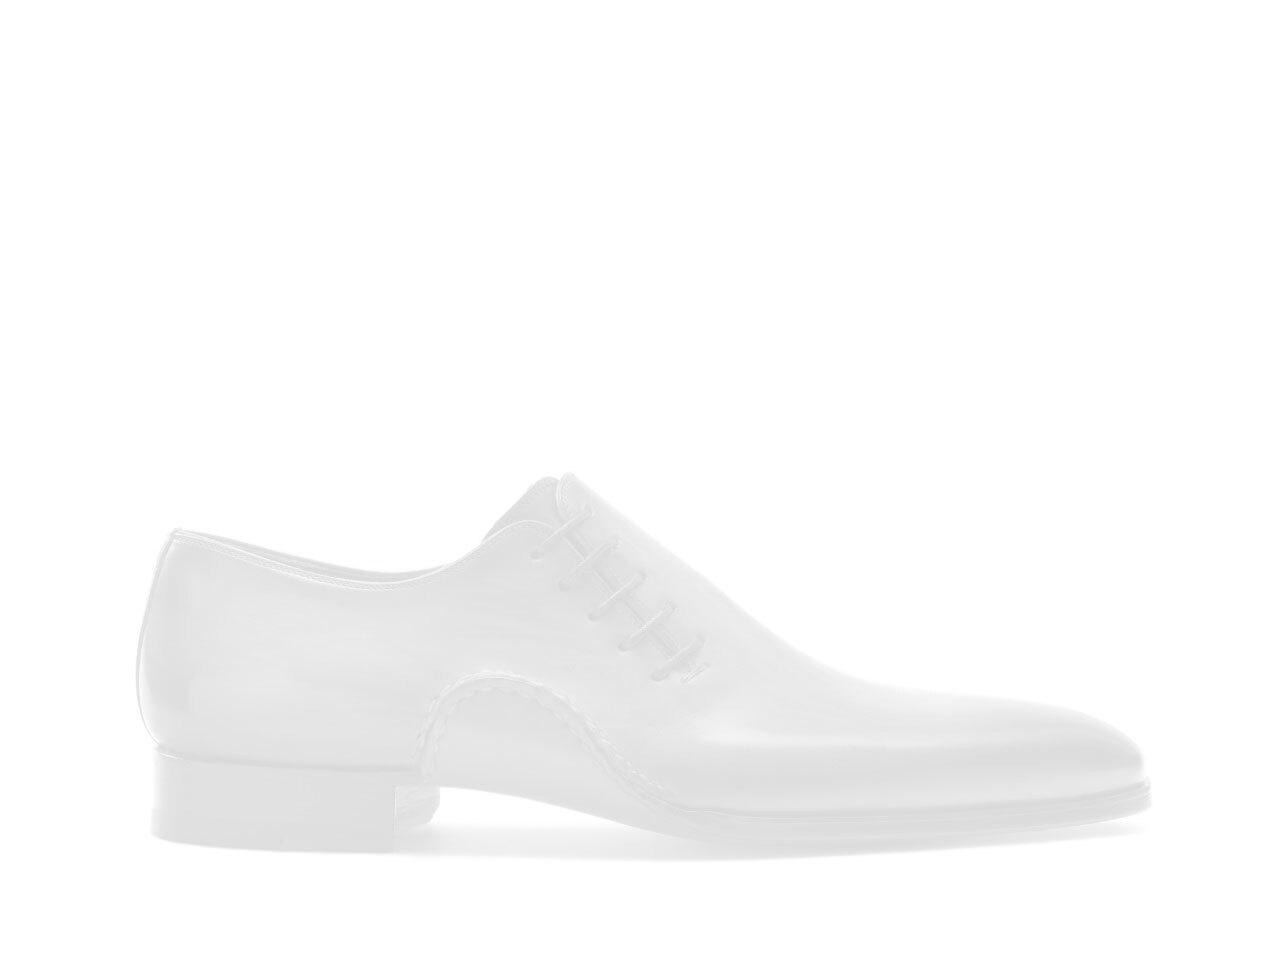 Pair of the Magnanni Merino II Navy Men's Sneakers